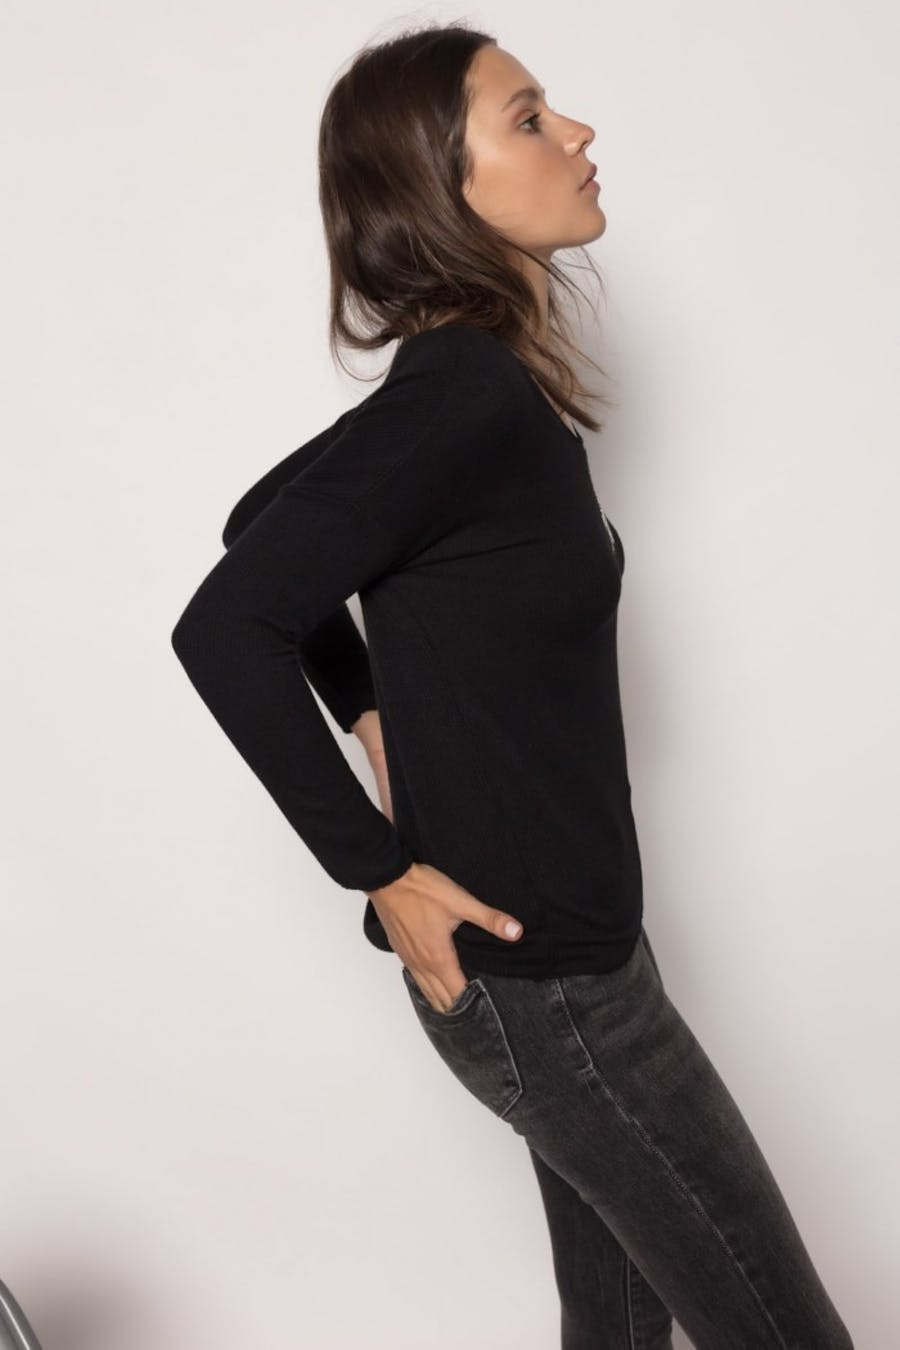 Camiseta massima grazia textura Negro